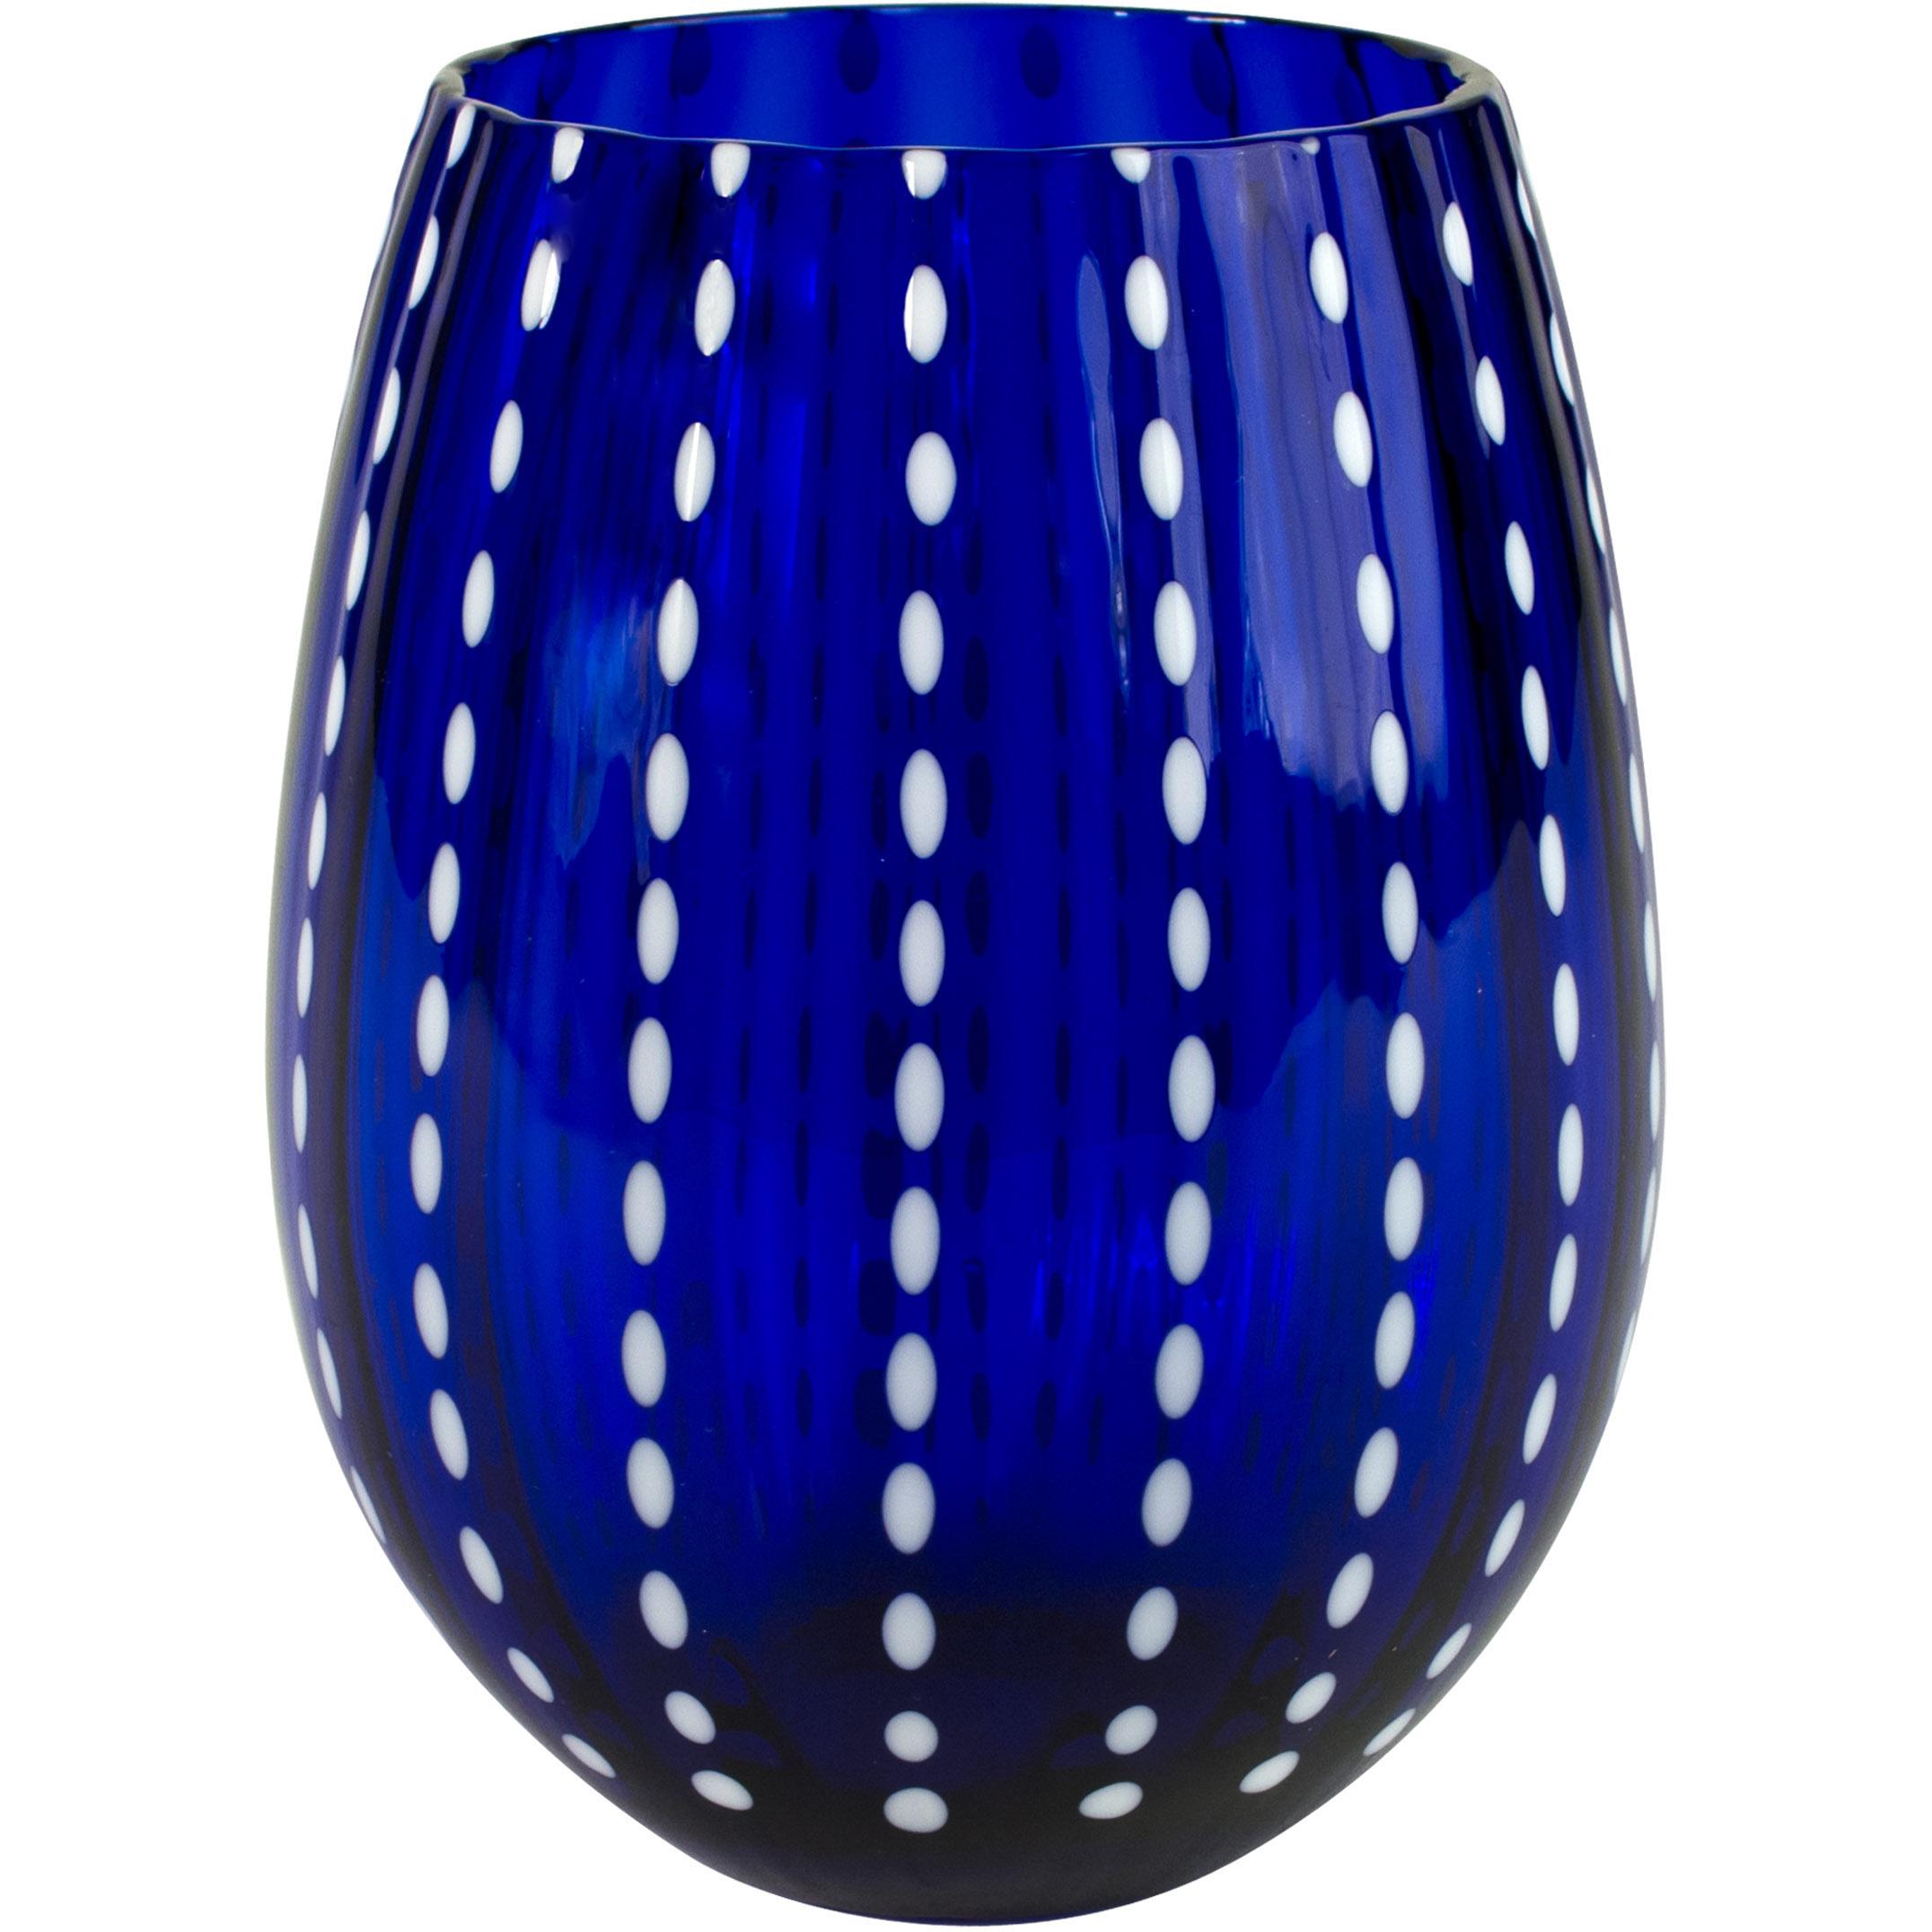 Artland Cambria Cobalt Stemless Tumbler Drinking Glass, 17 Ounce